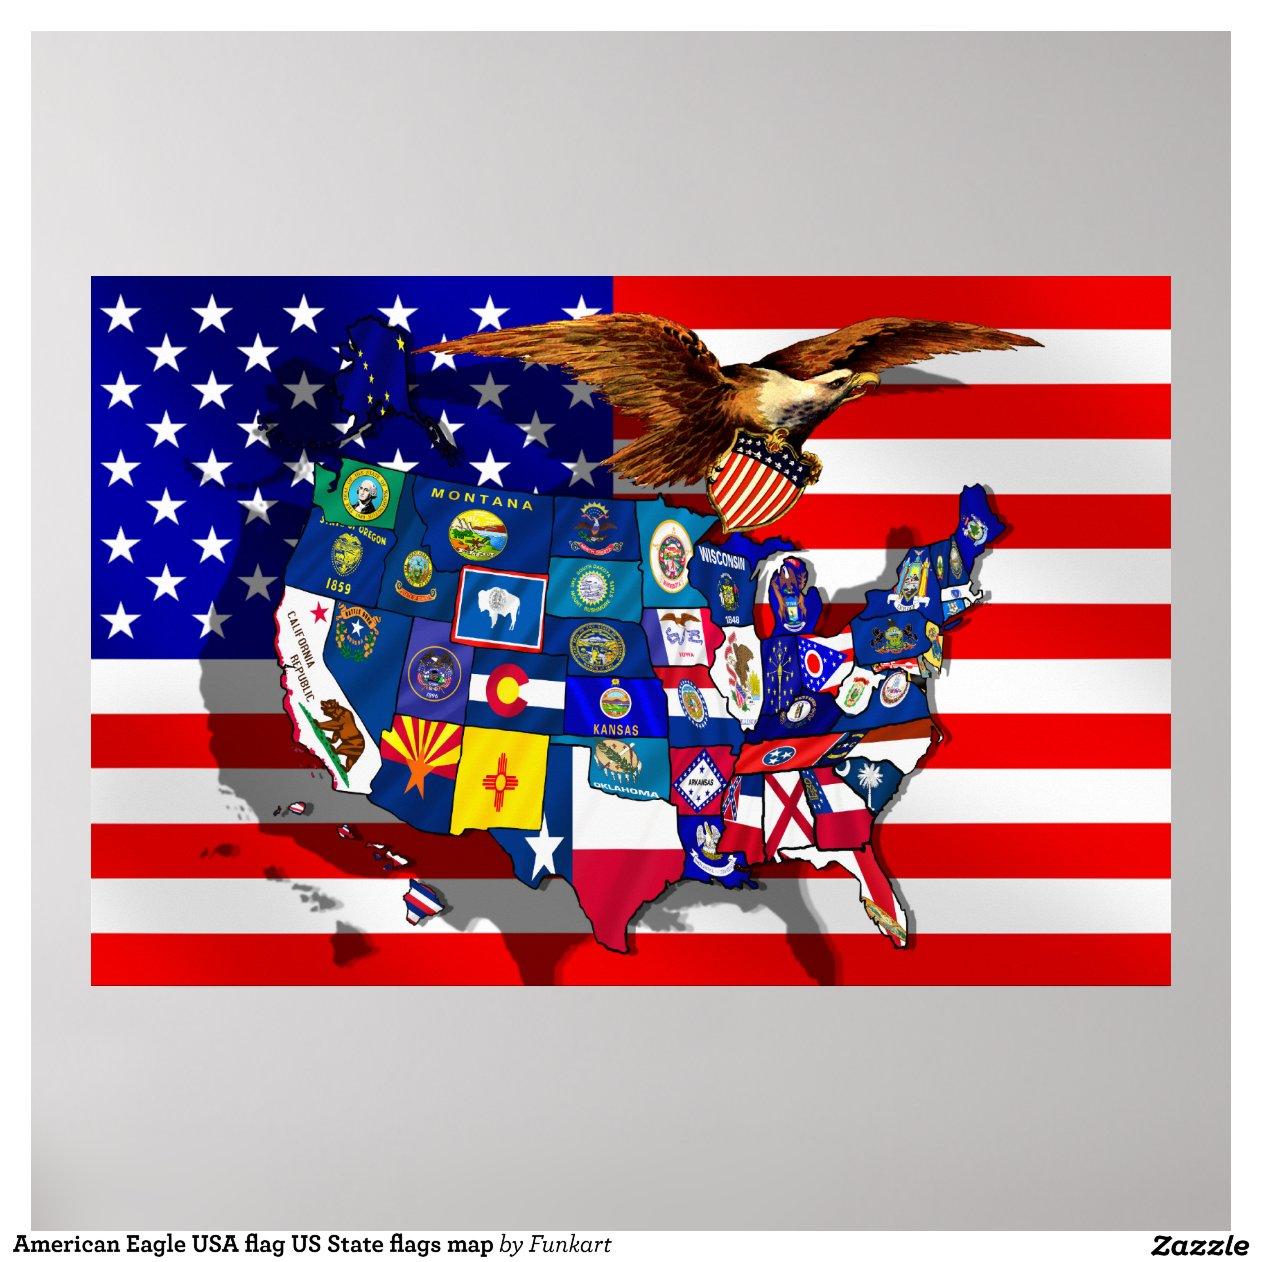 American Eagle USA Flag